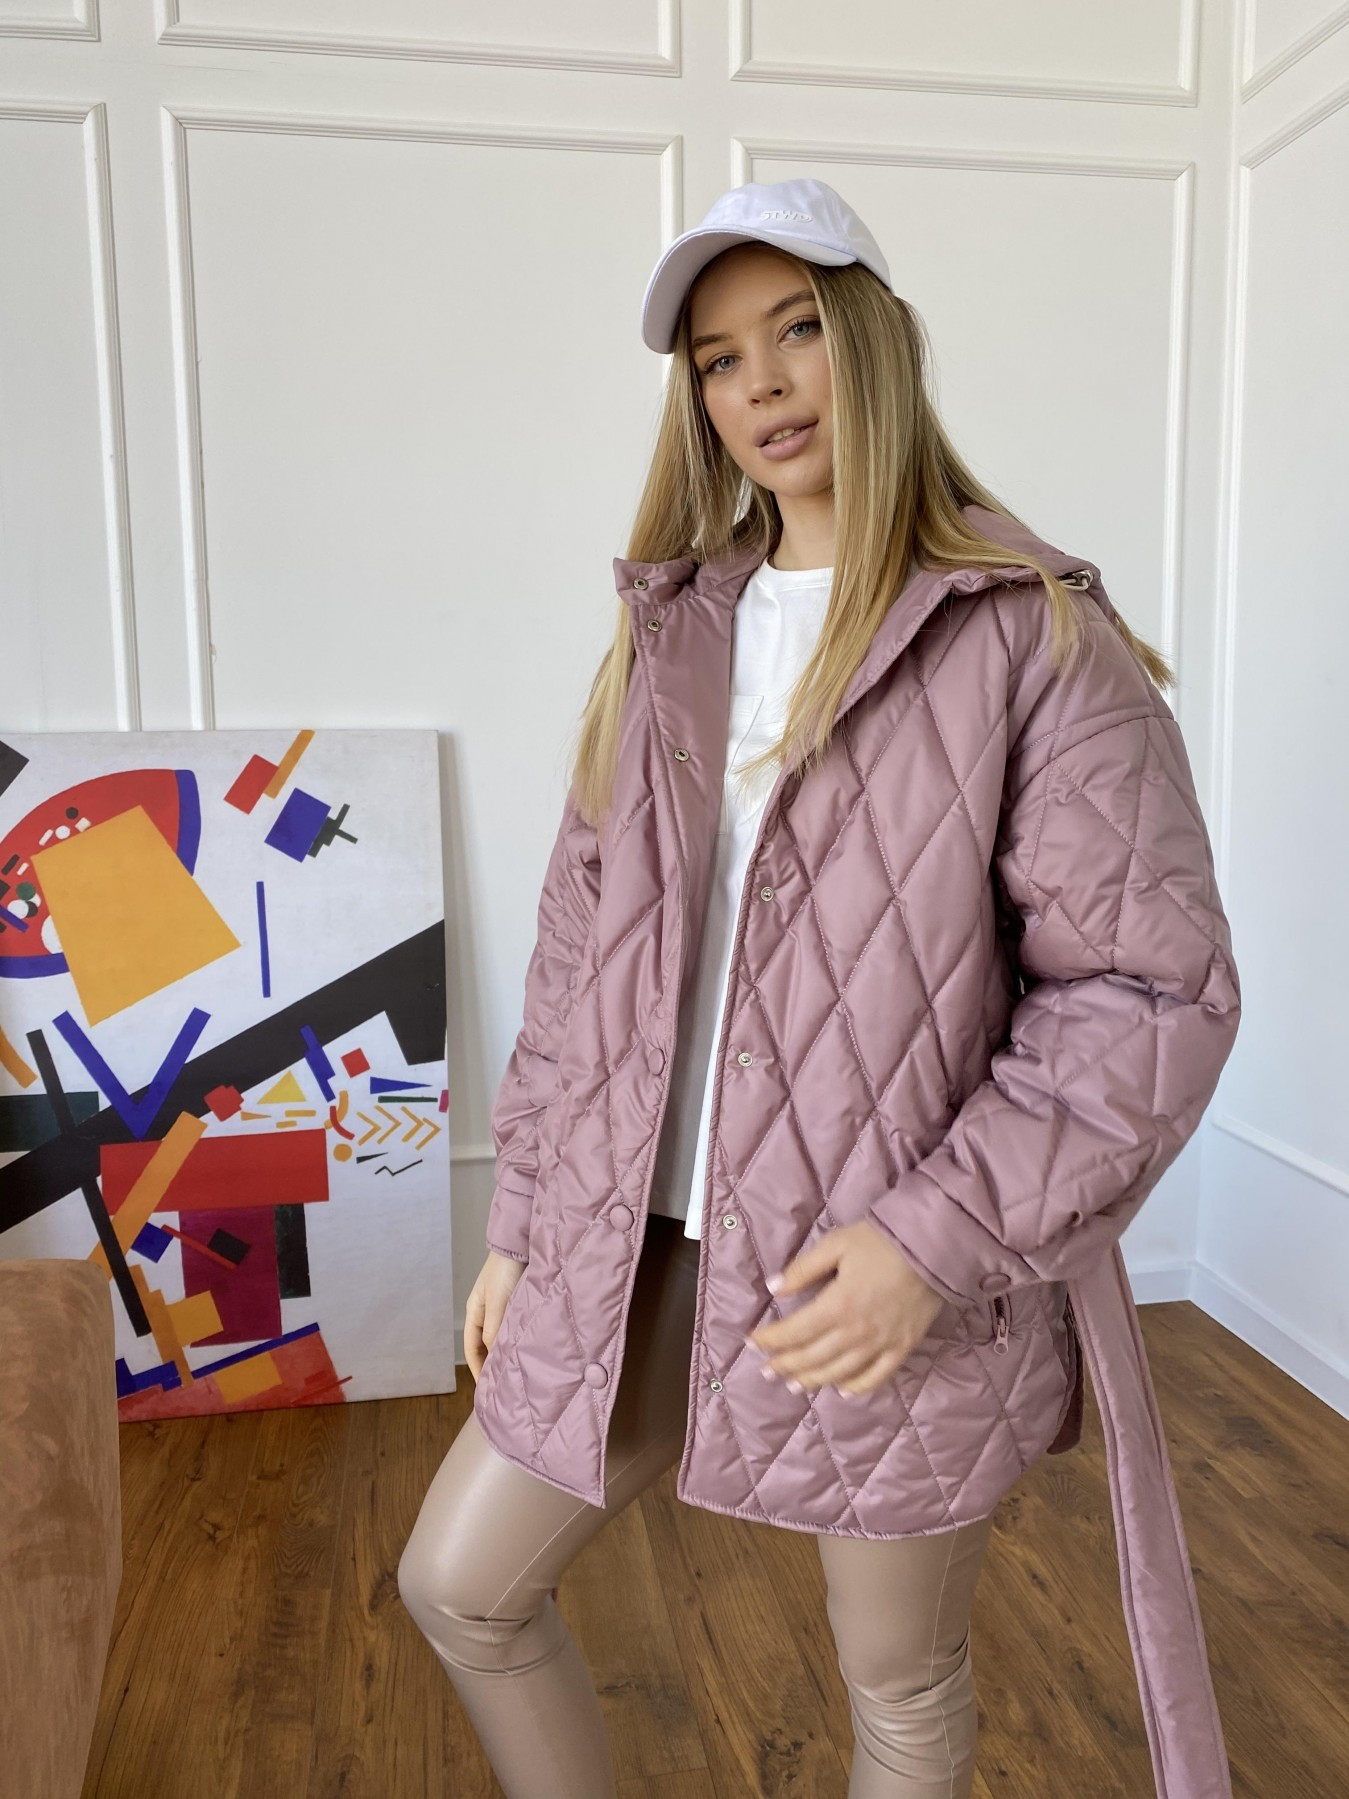 Пазл стеганая куртка из плащевки 10890 АРТ. 47400 Цвет: Пудра - фото 4, интернет магазин tm-modus.ru